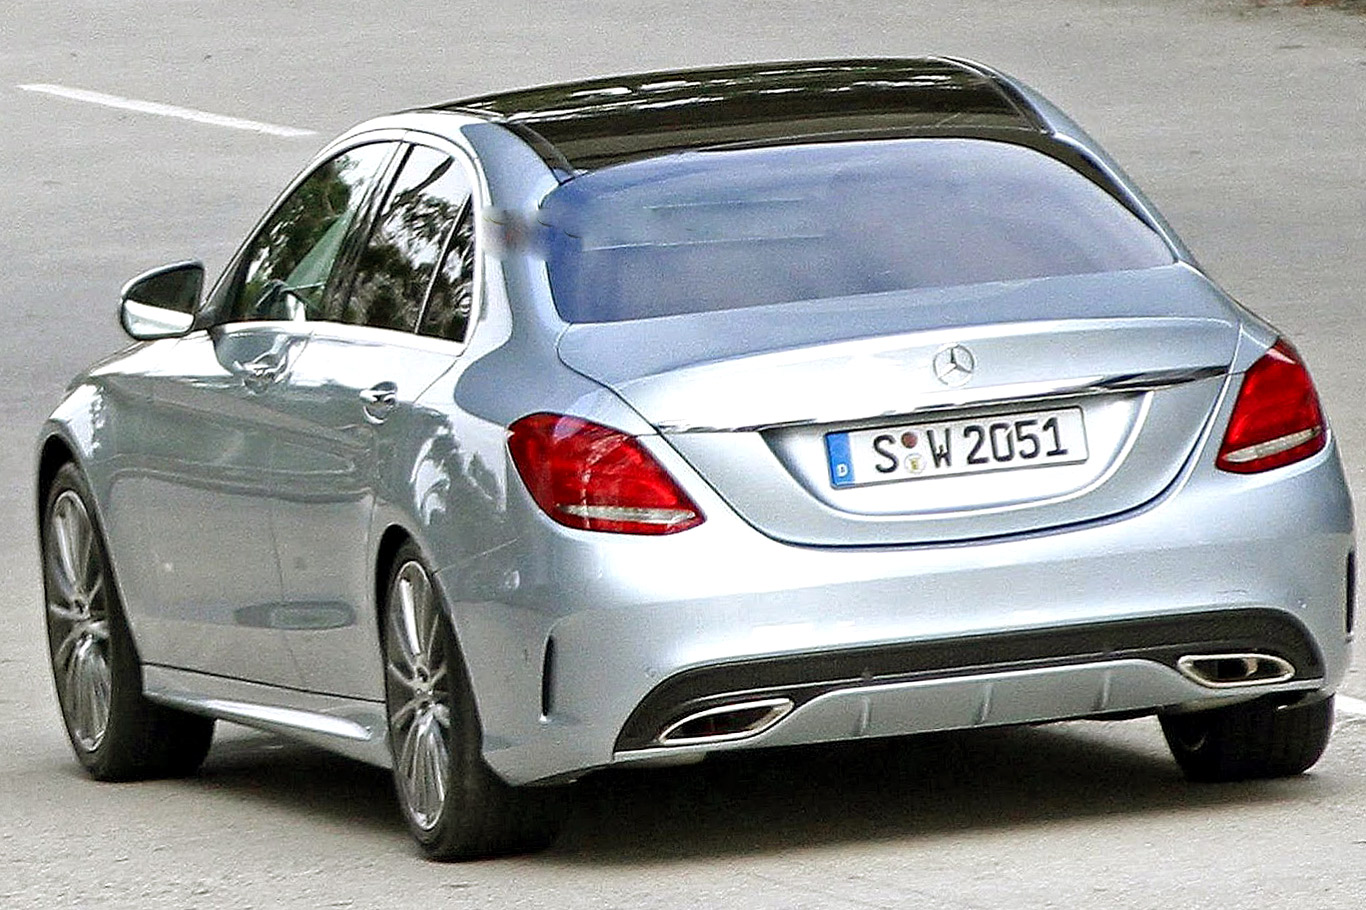 Mercedes-Benz C-klasse AMG IV (W205) 2014 - now Cabriolet #5